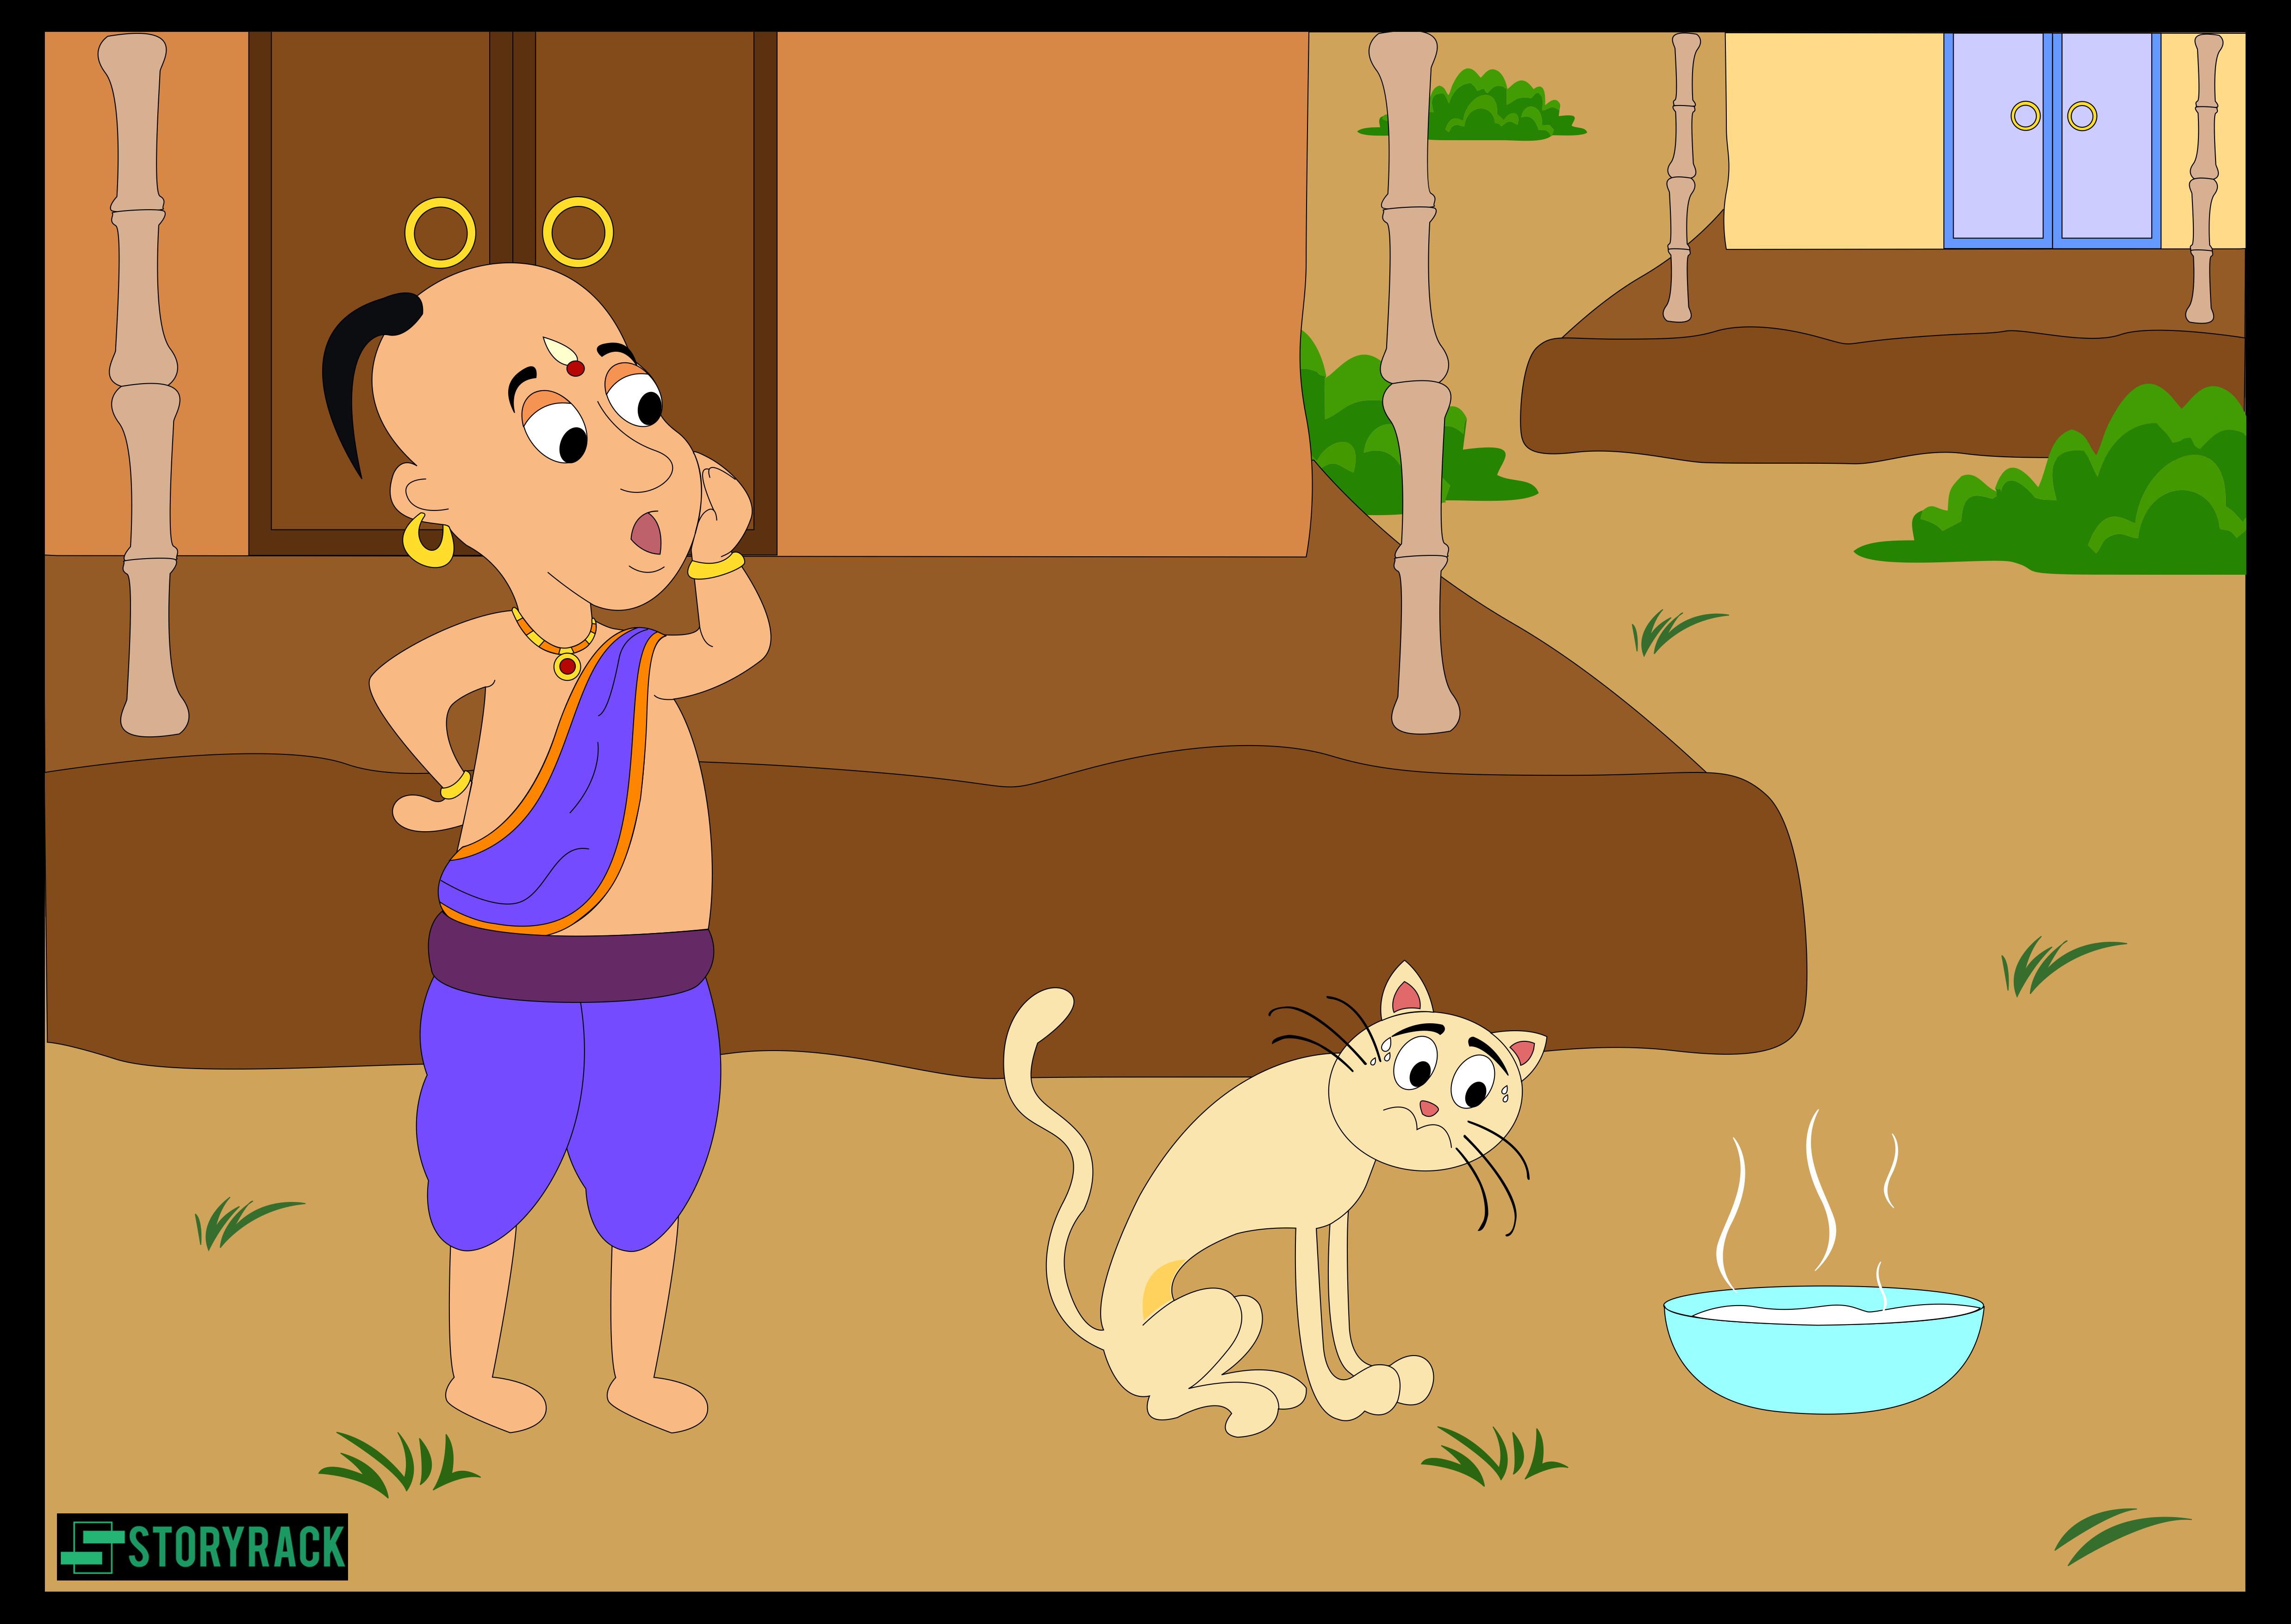 Tenali and his Cat